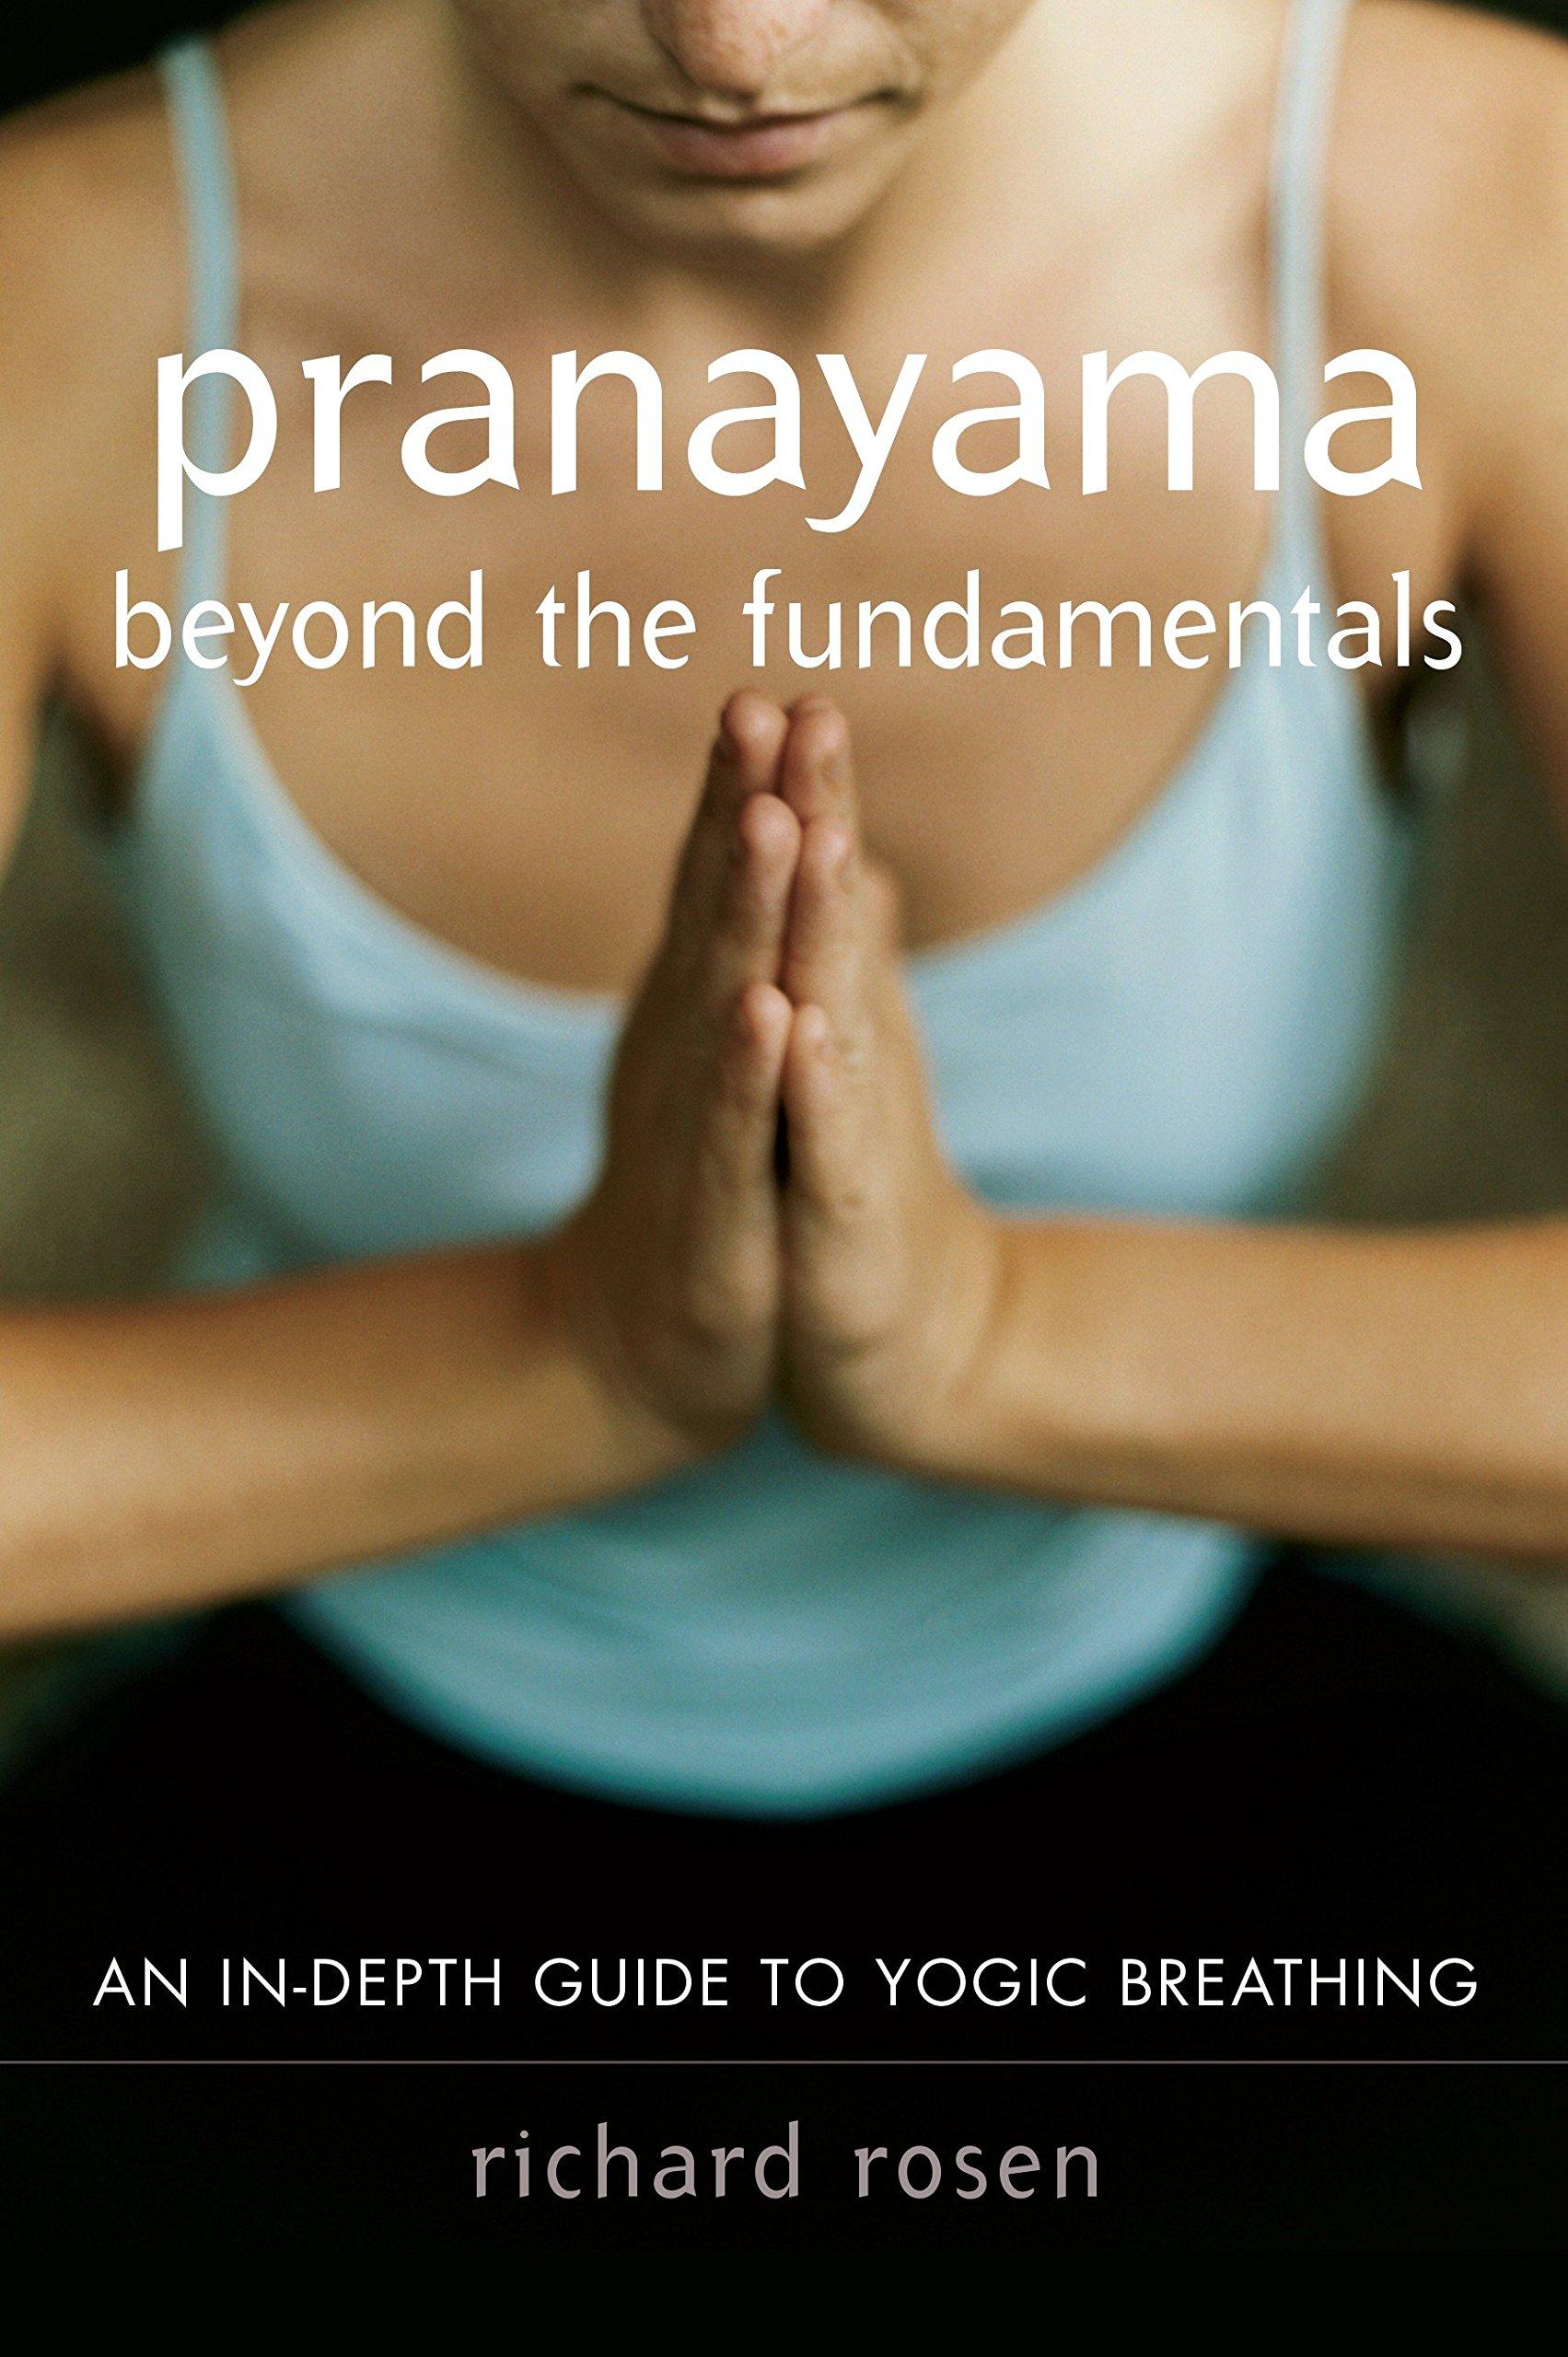 Download Pranayama beyond the Fundamentals: An In-Depth Guide to Yogic Breathing pdf